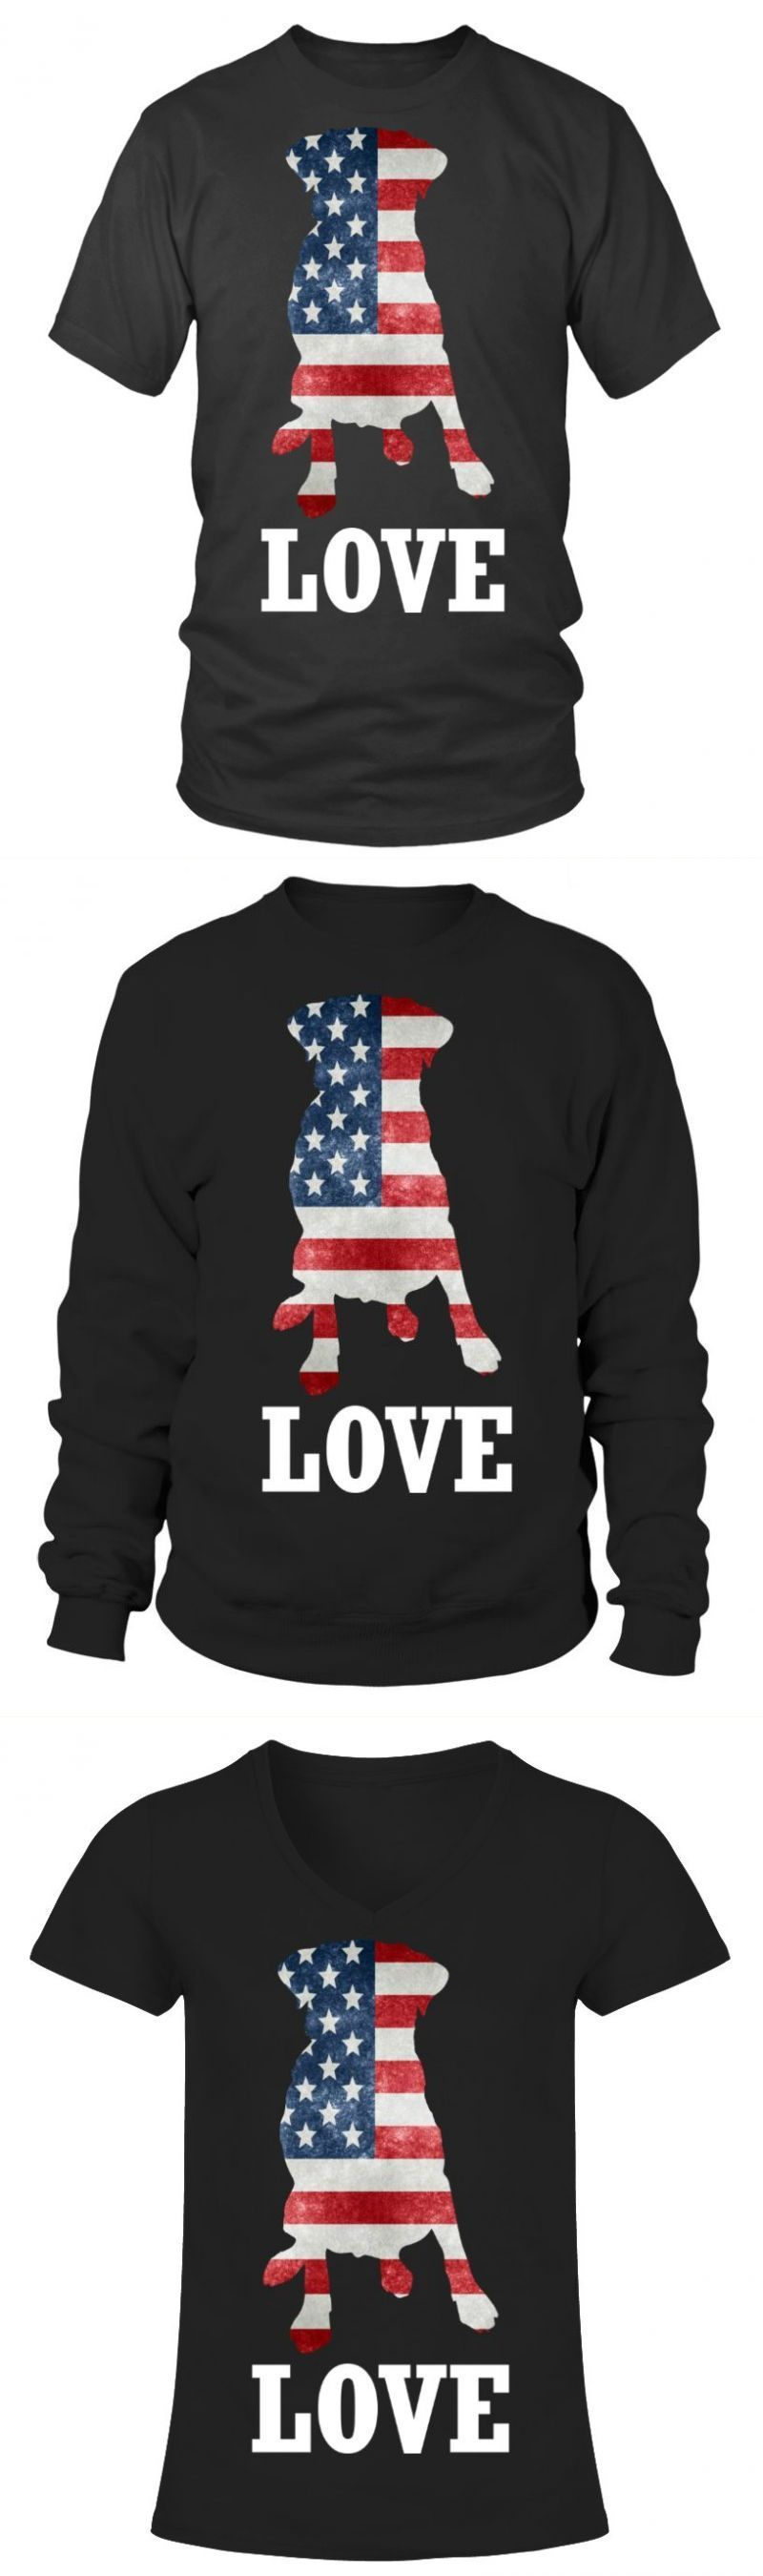 Dog lover gift patriotic american flag dog hot shirt uae